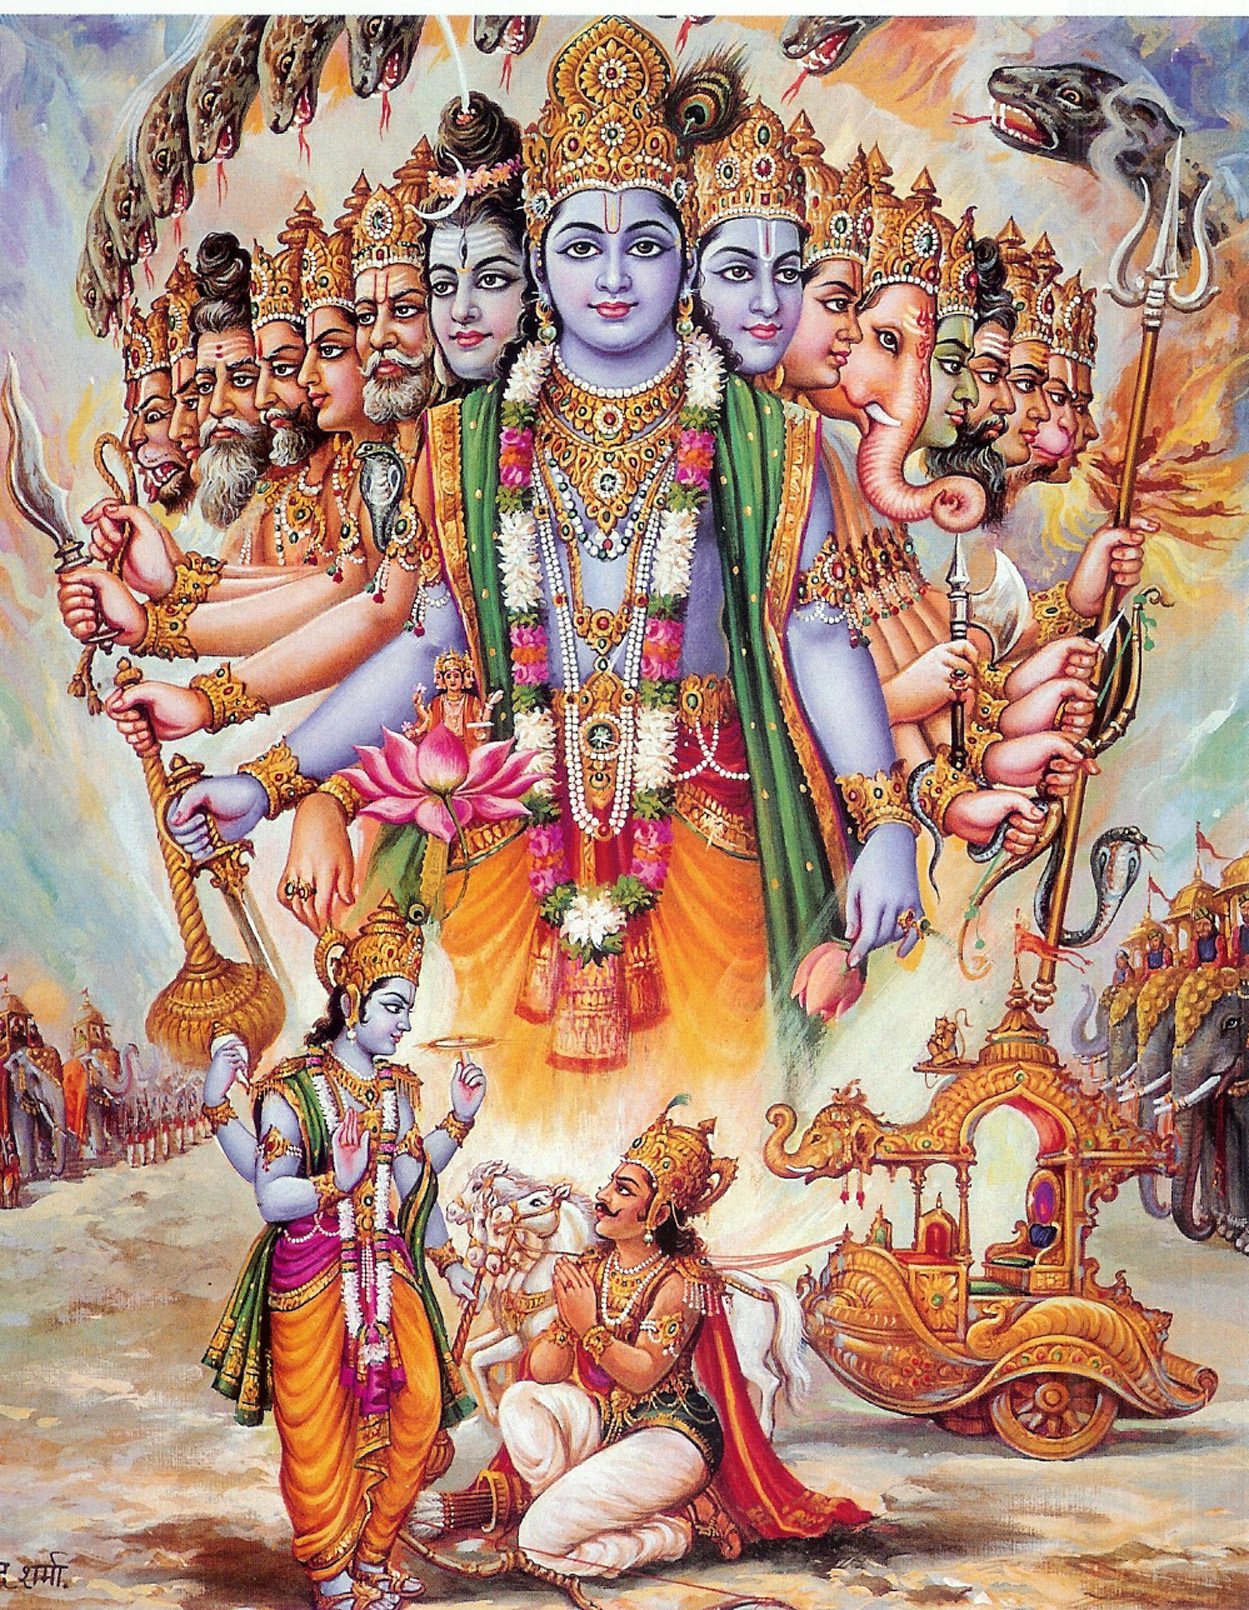 Bhagavad-Gita virat form